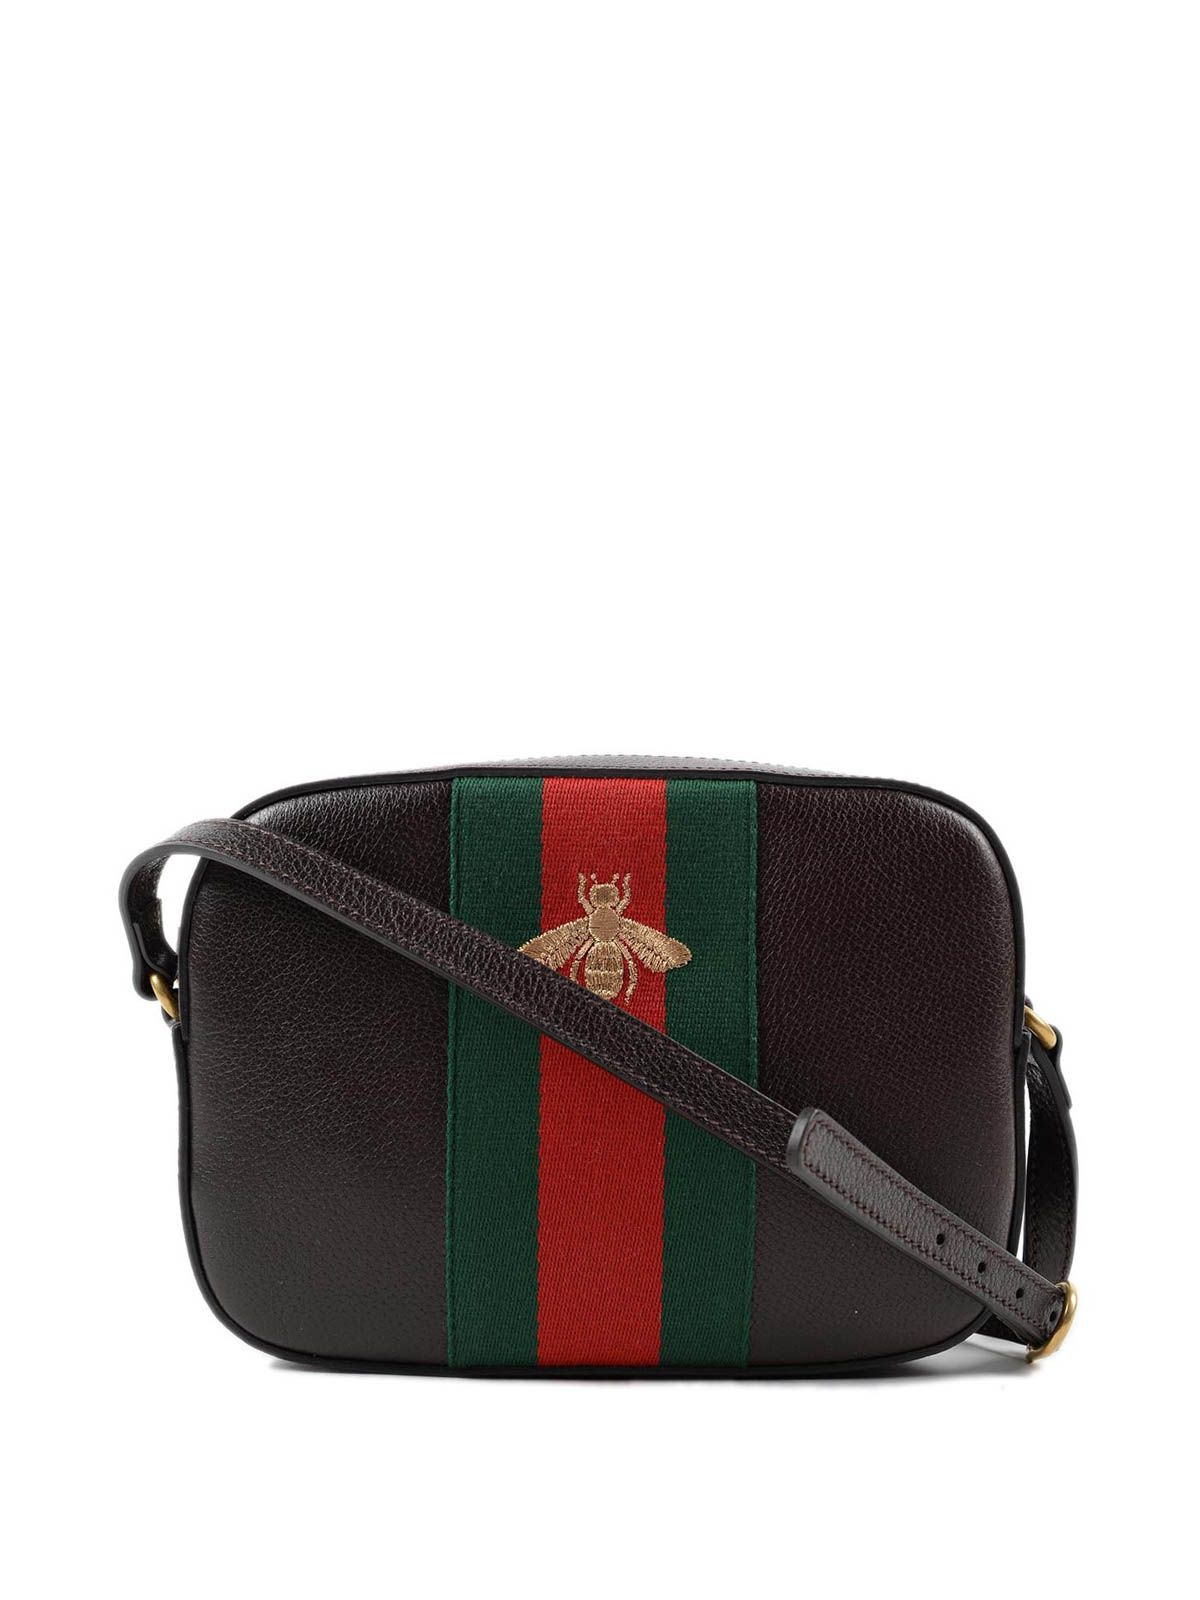 6e5bffaac81a2 Gucci: cross body bags - Bee embroidery leather mini bag   a/w in ...